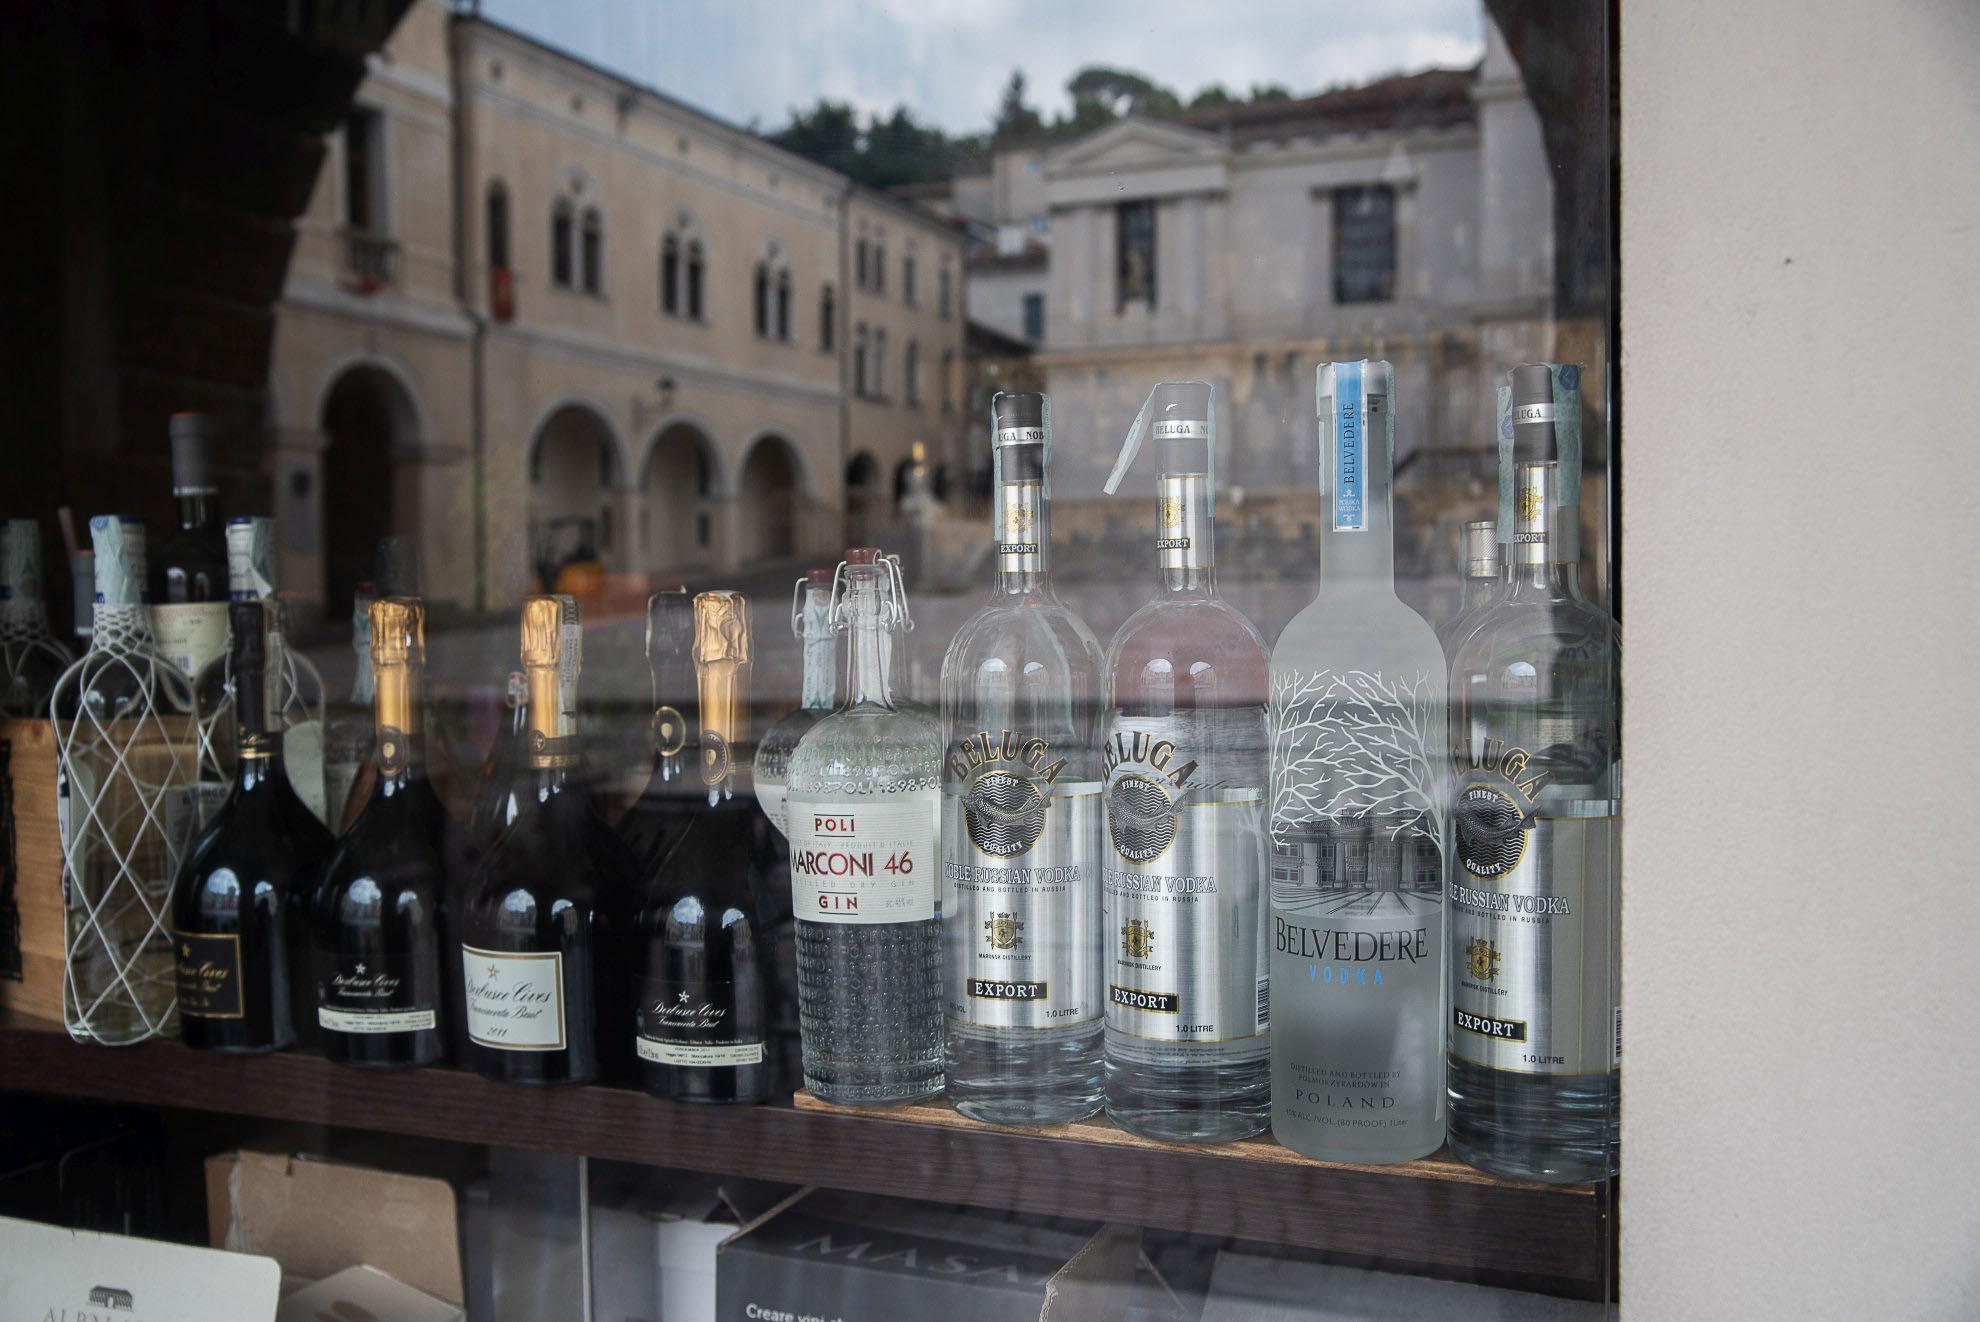 Polska wódka Belvedere w sercu produkcji prosecco - Valdobbiadene-Conegliano